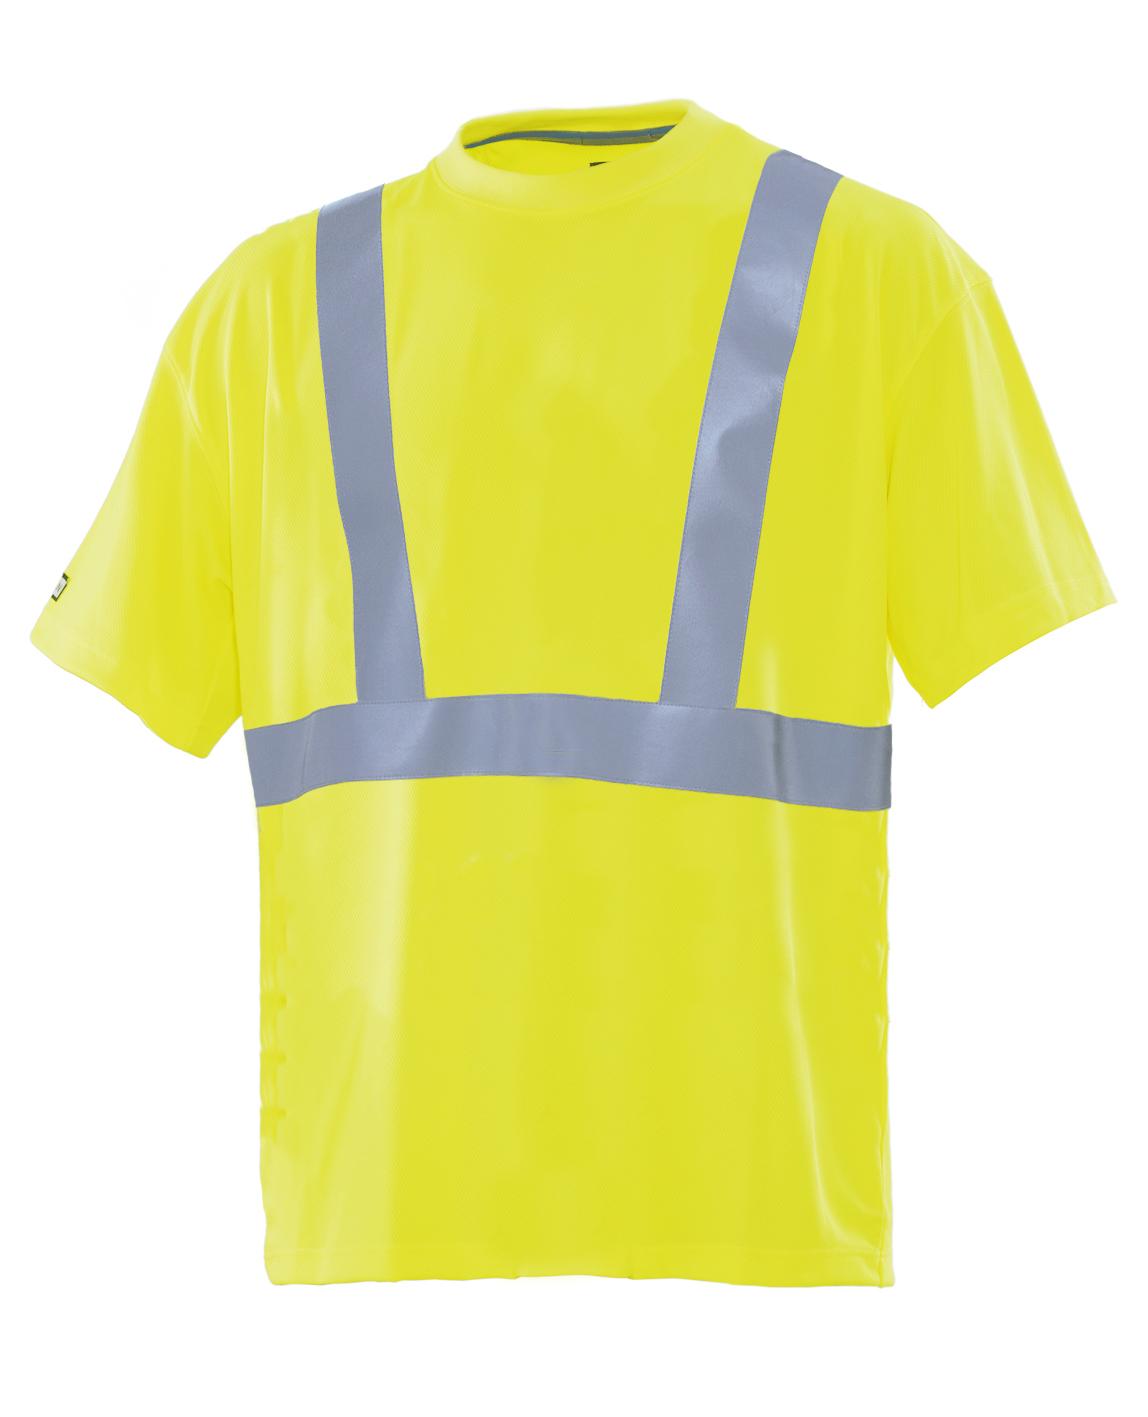 5585 T-shirt Hi-Vis 3XL jaune